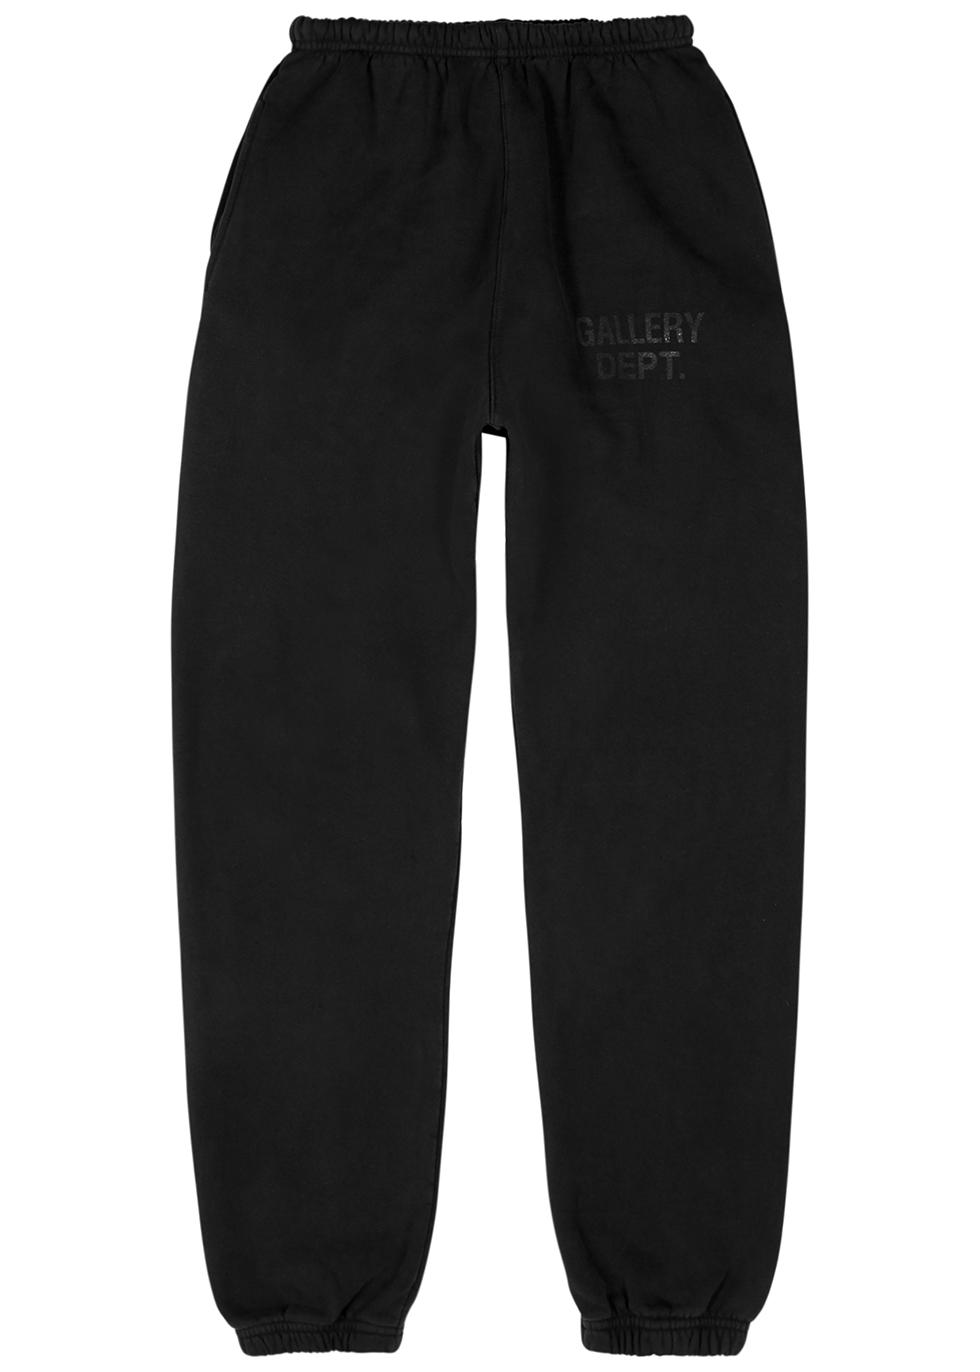 Black faded cotton sweatpants